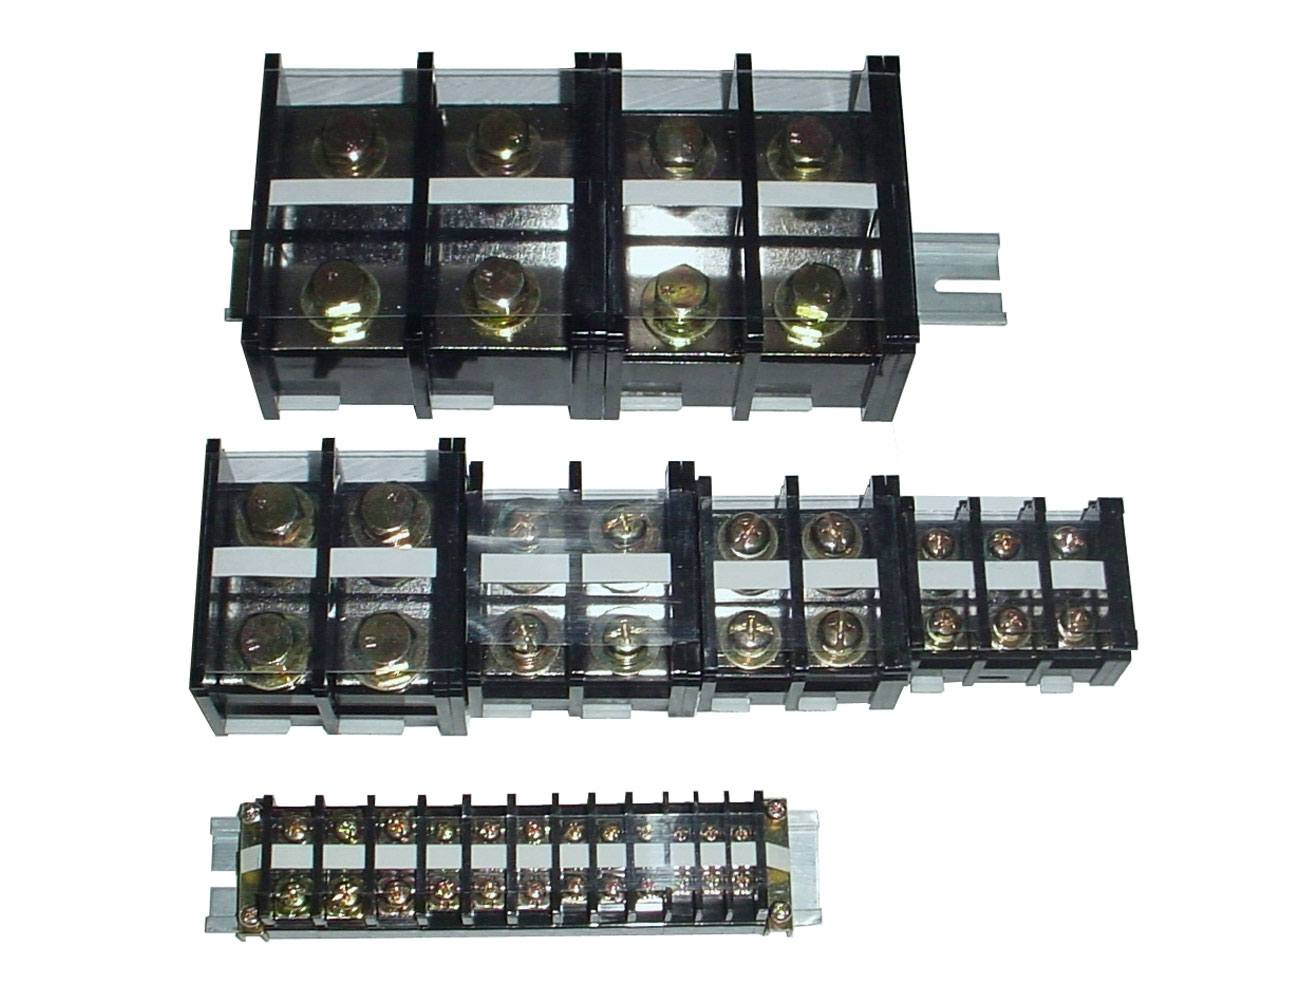 TE系列 軌道組合式端子台 - TE系列 35mm軌道組合式式端子台